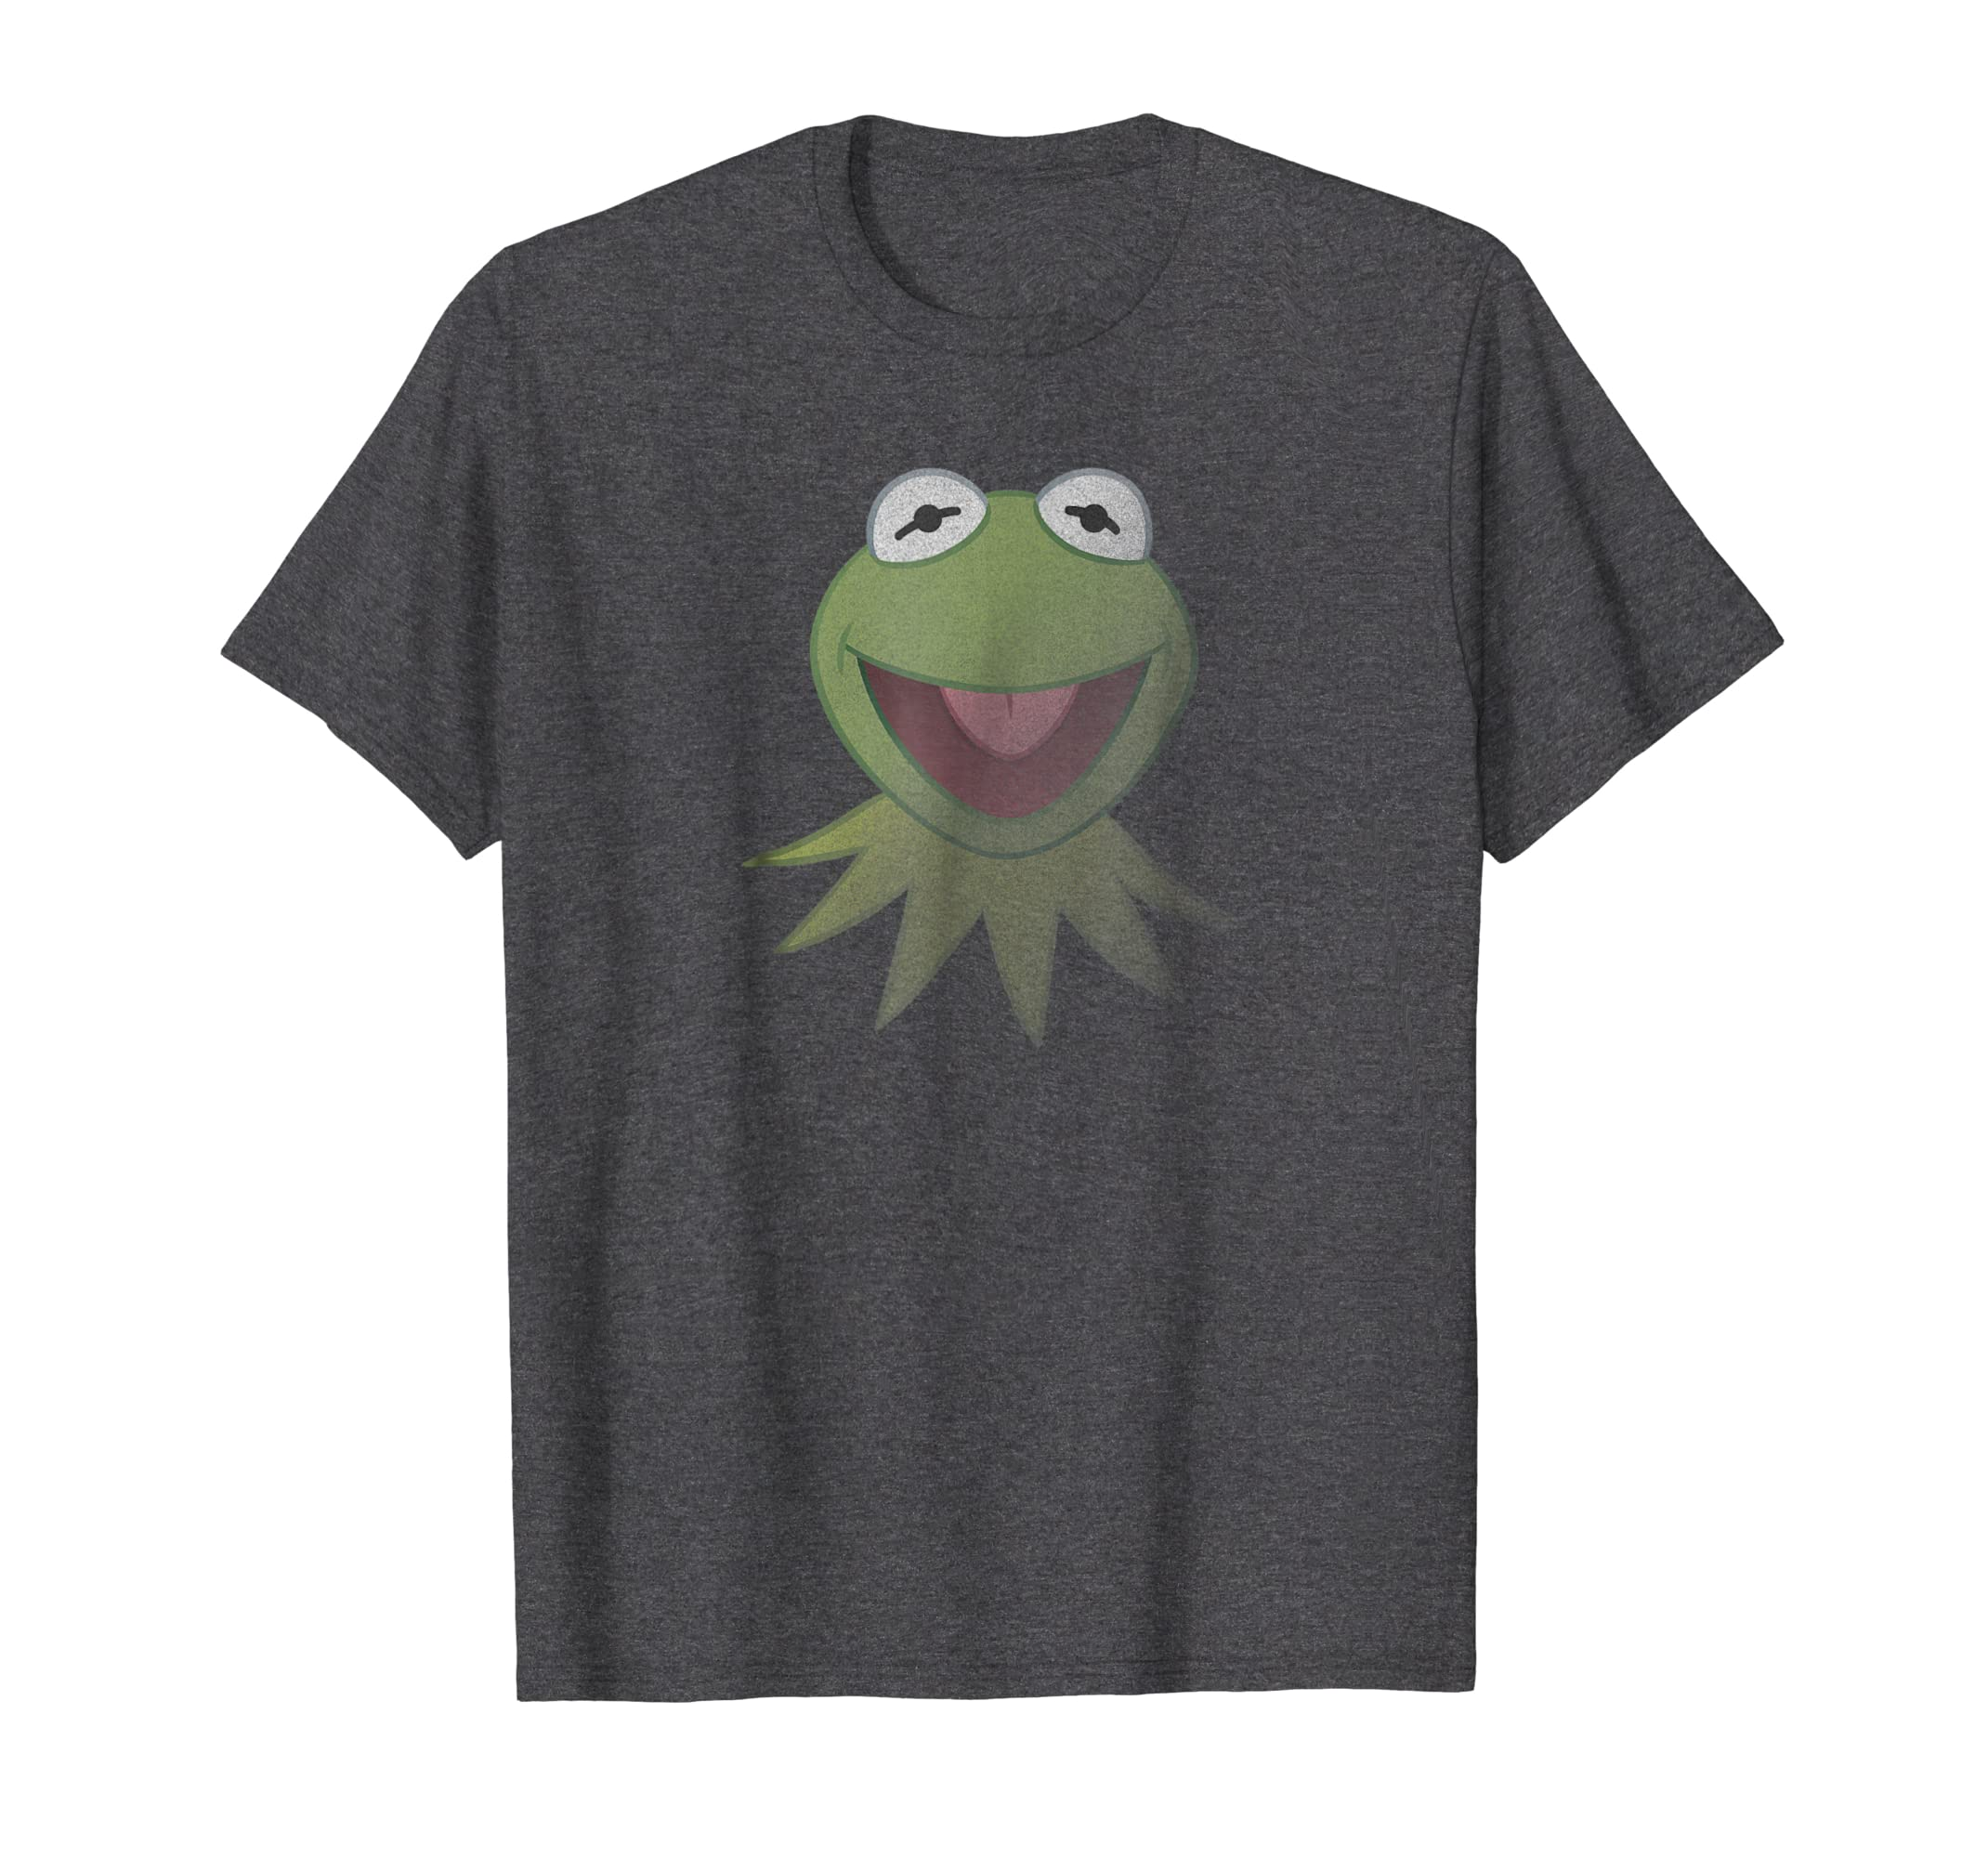 c90bfbaa Amazon.com: Disney Muppets Kermit the Frog Face T-Shirt: Clothing